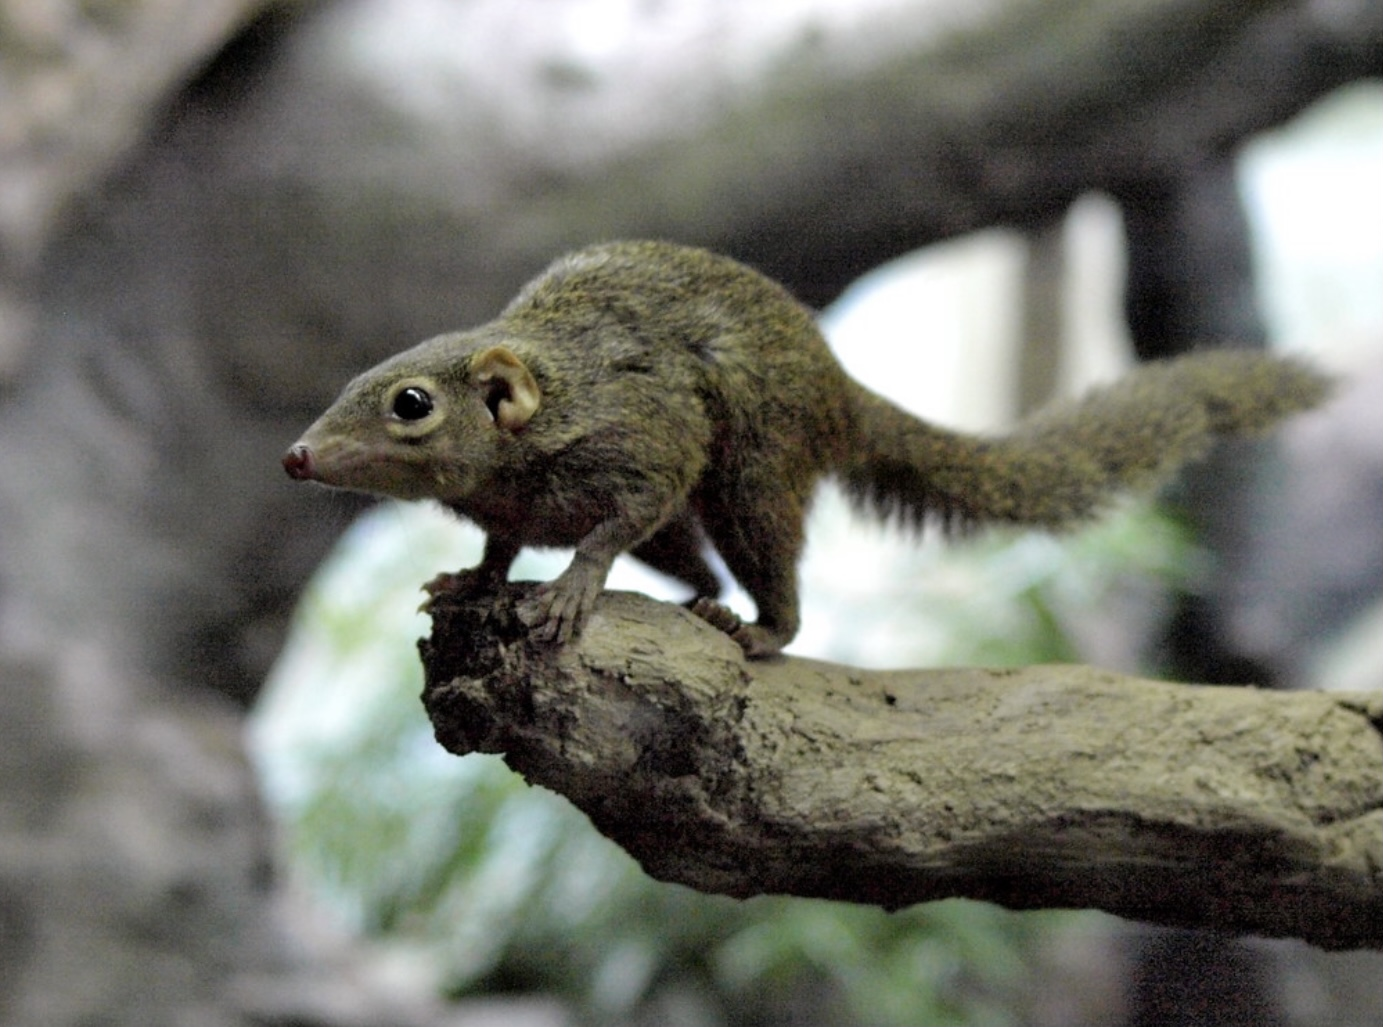 Those damn squirrels!-f3ff4dec-9858-4599-a984-9ad6c79e006a-jpeg